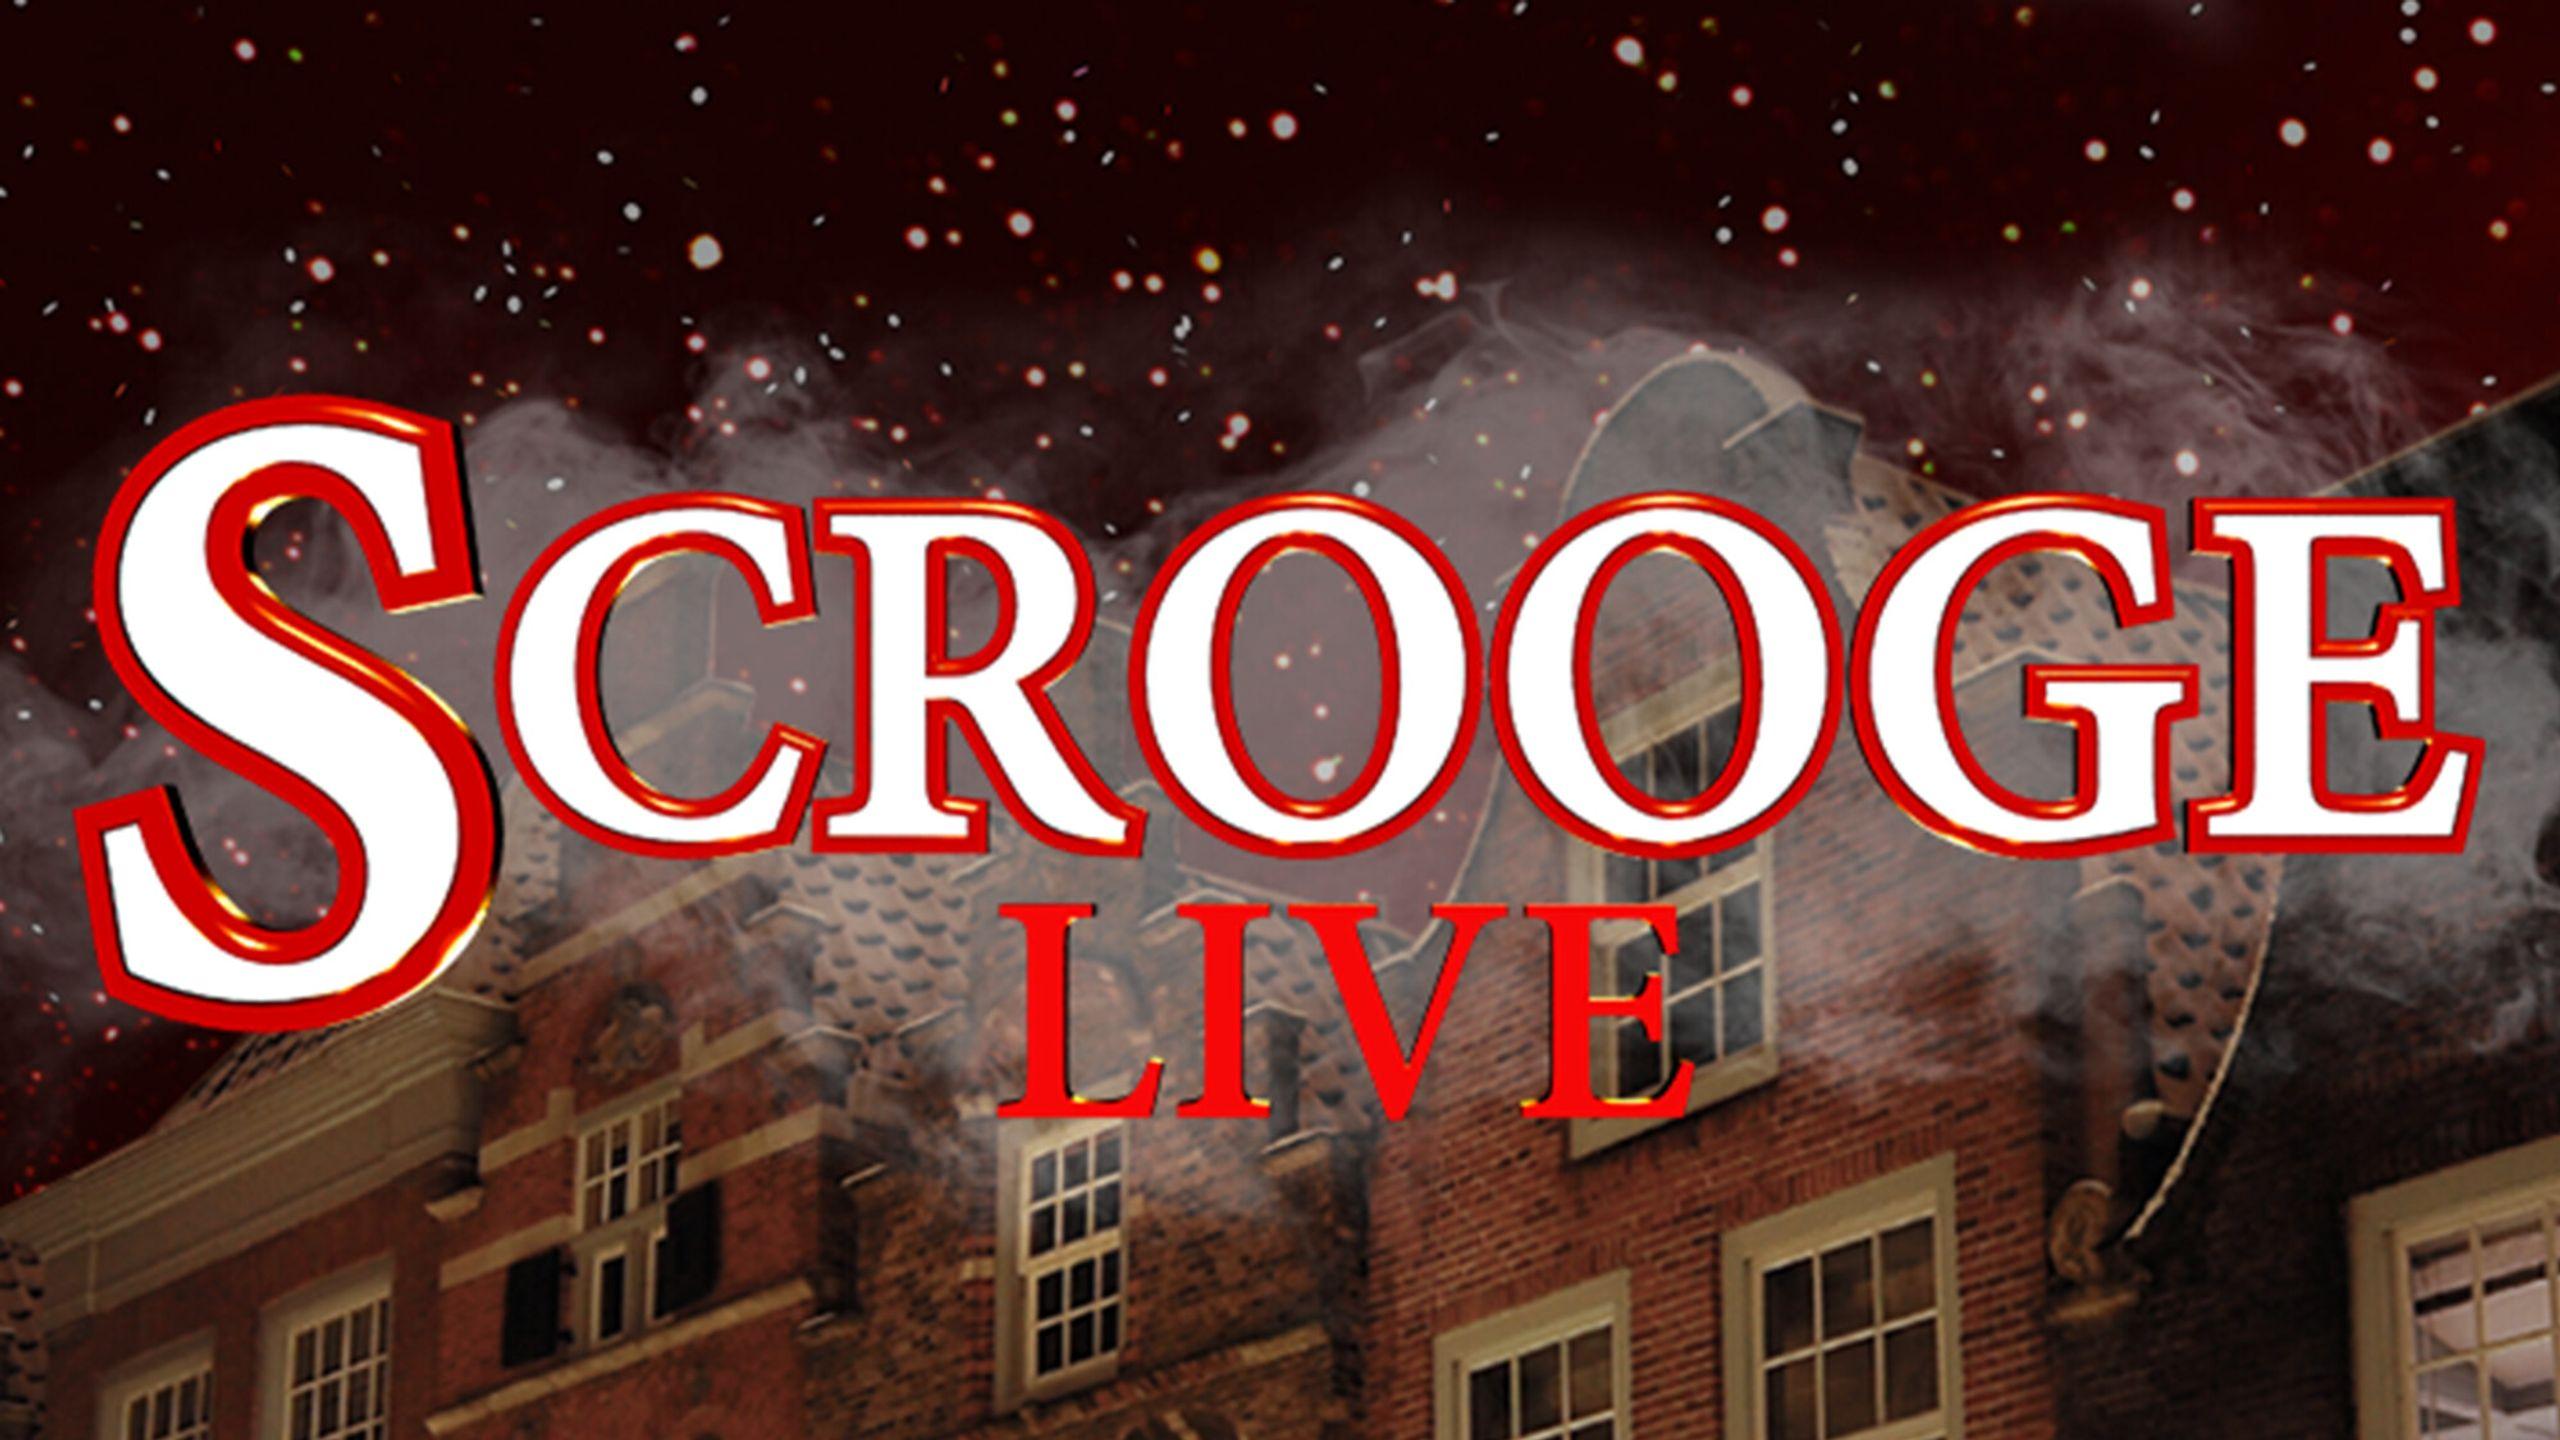 Scrooge Live